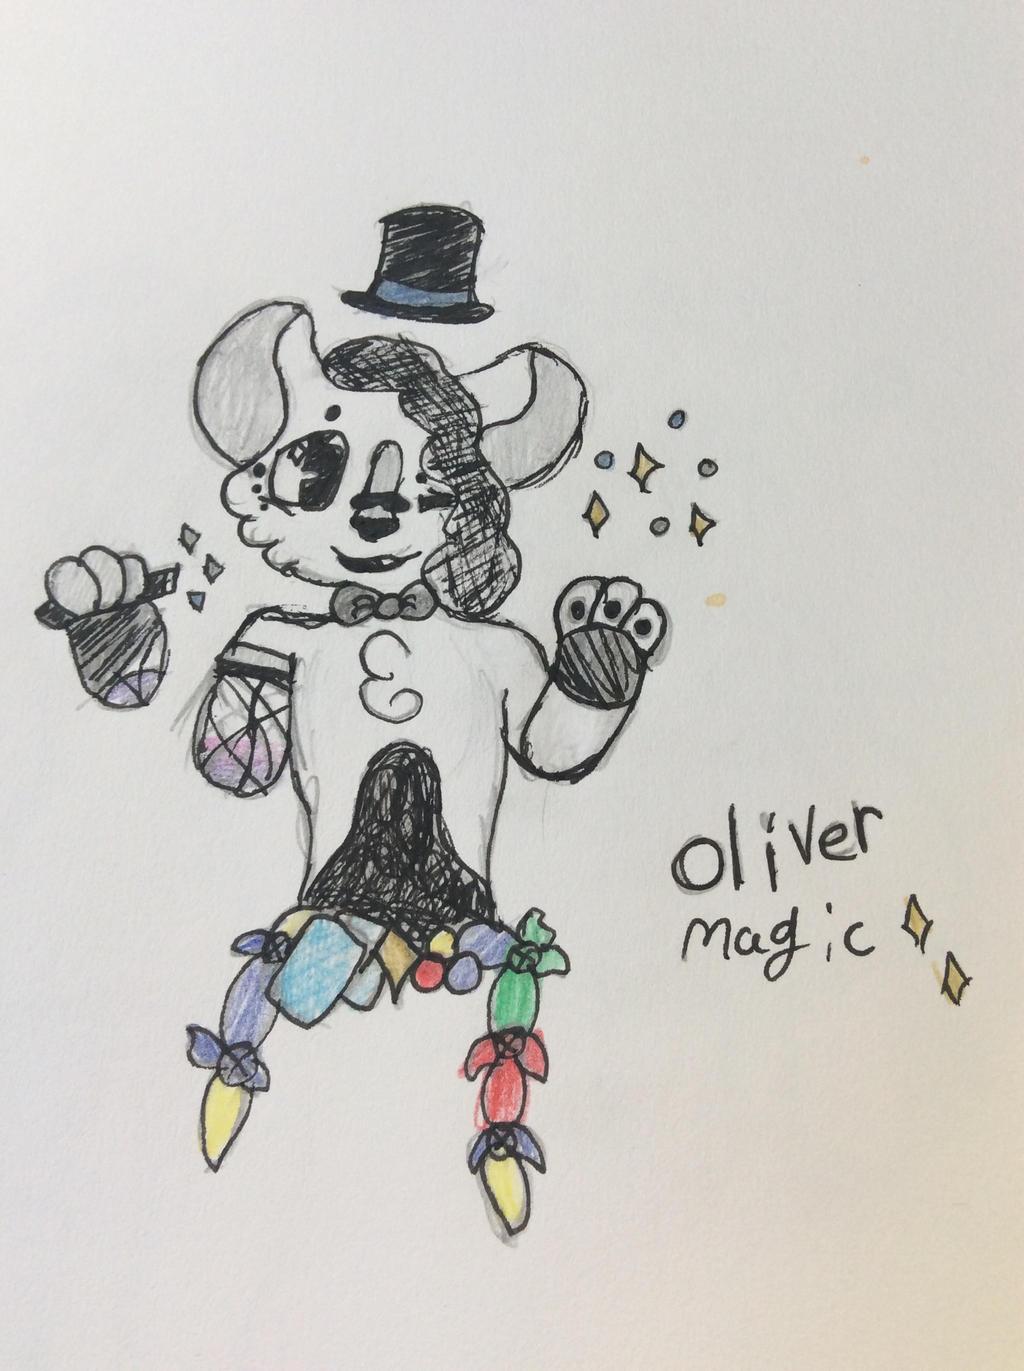 Oliver stap da magic  (com/gif) by Shadethewolf345